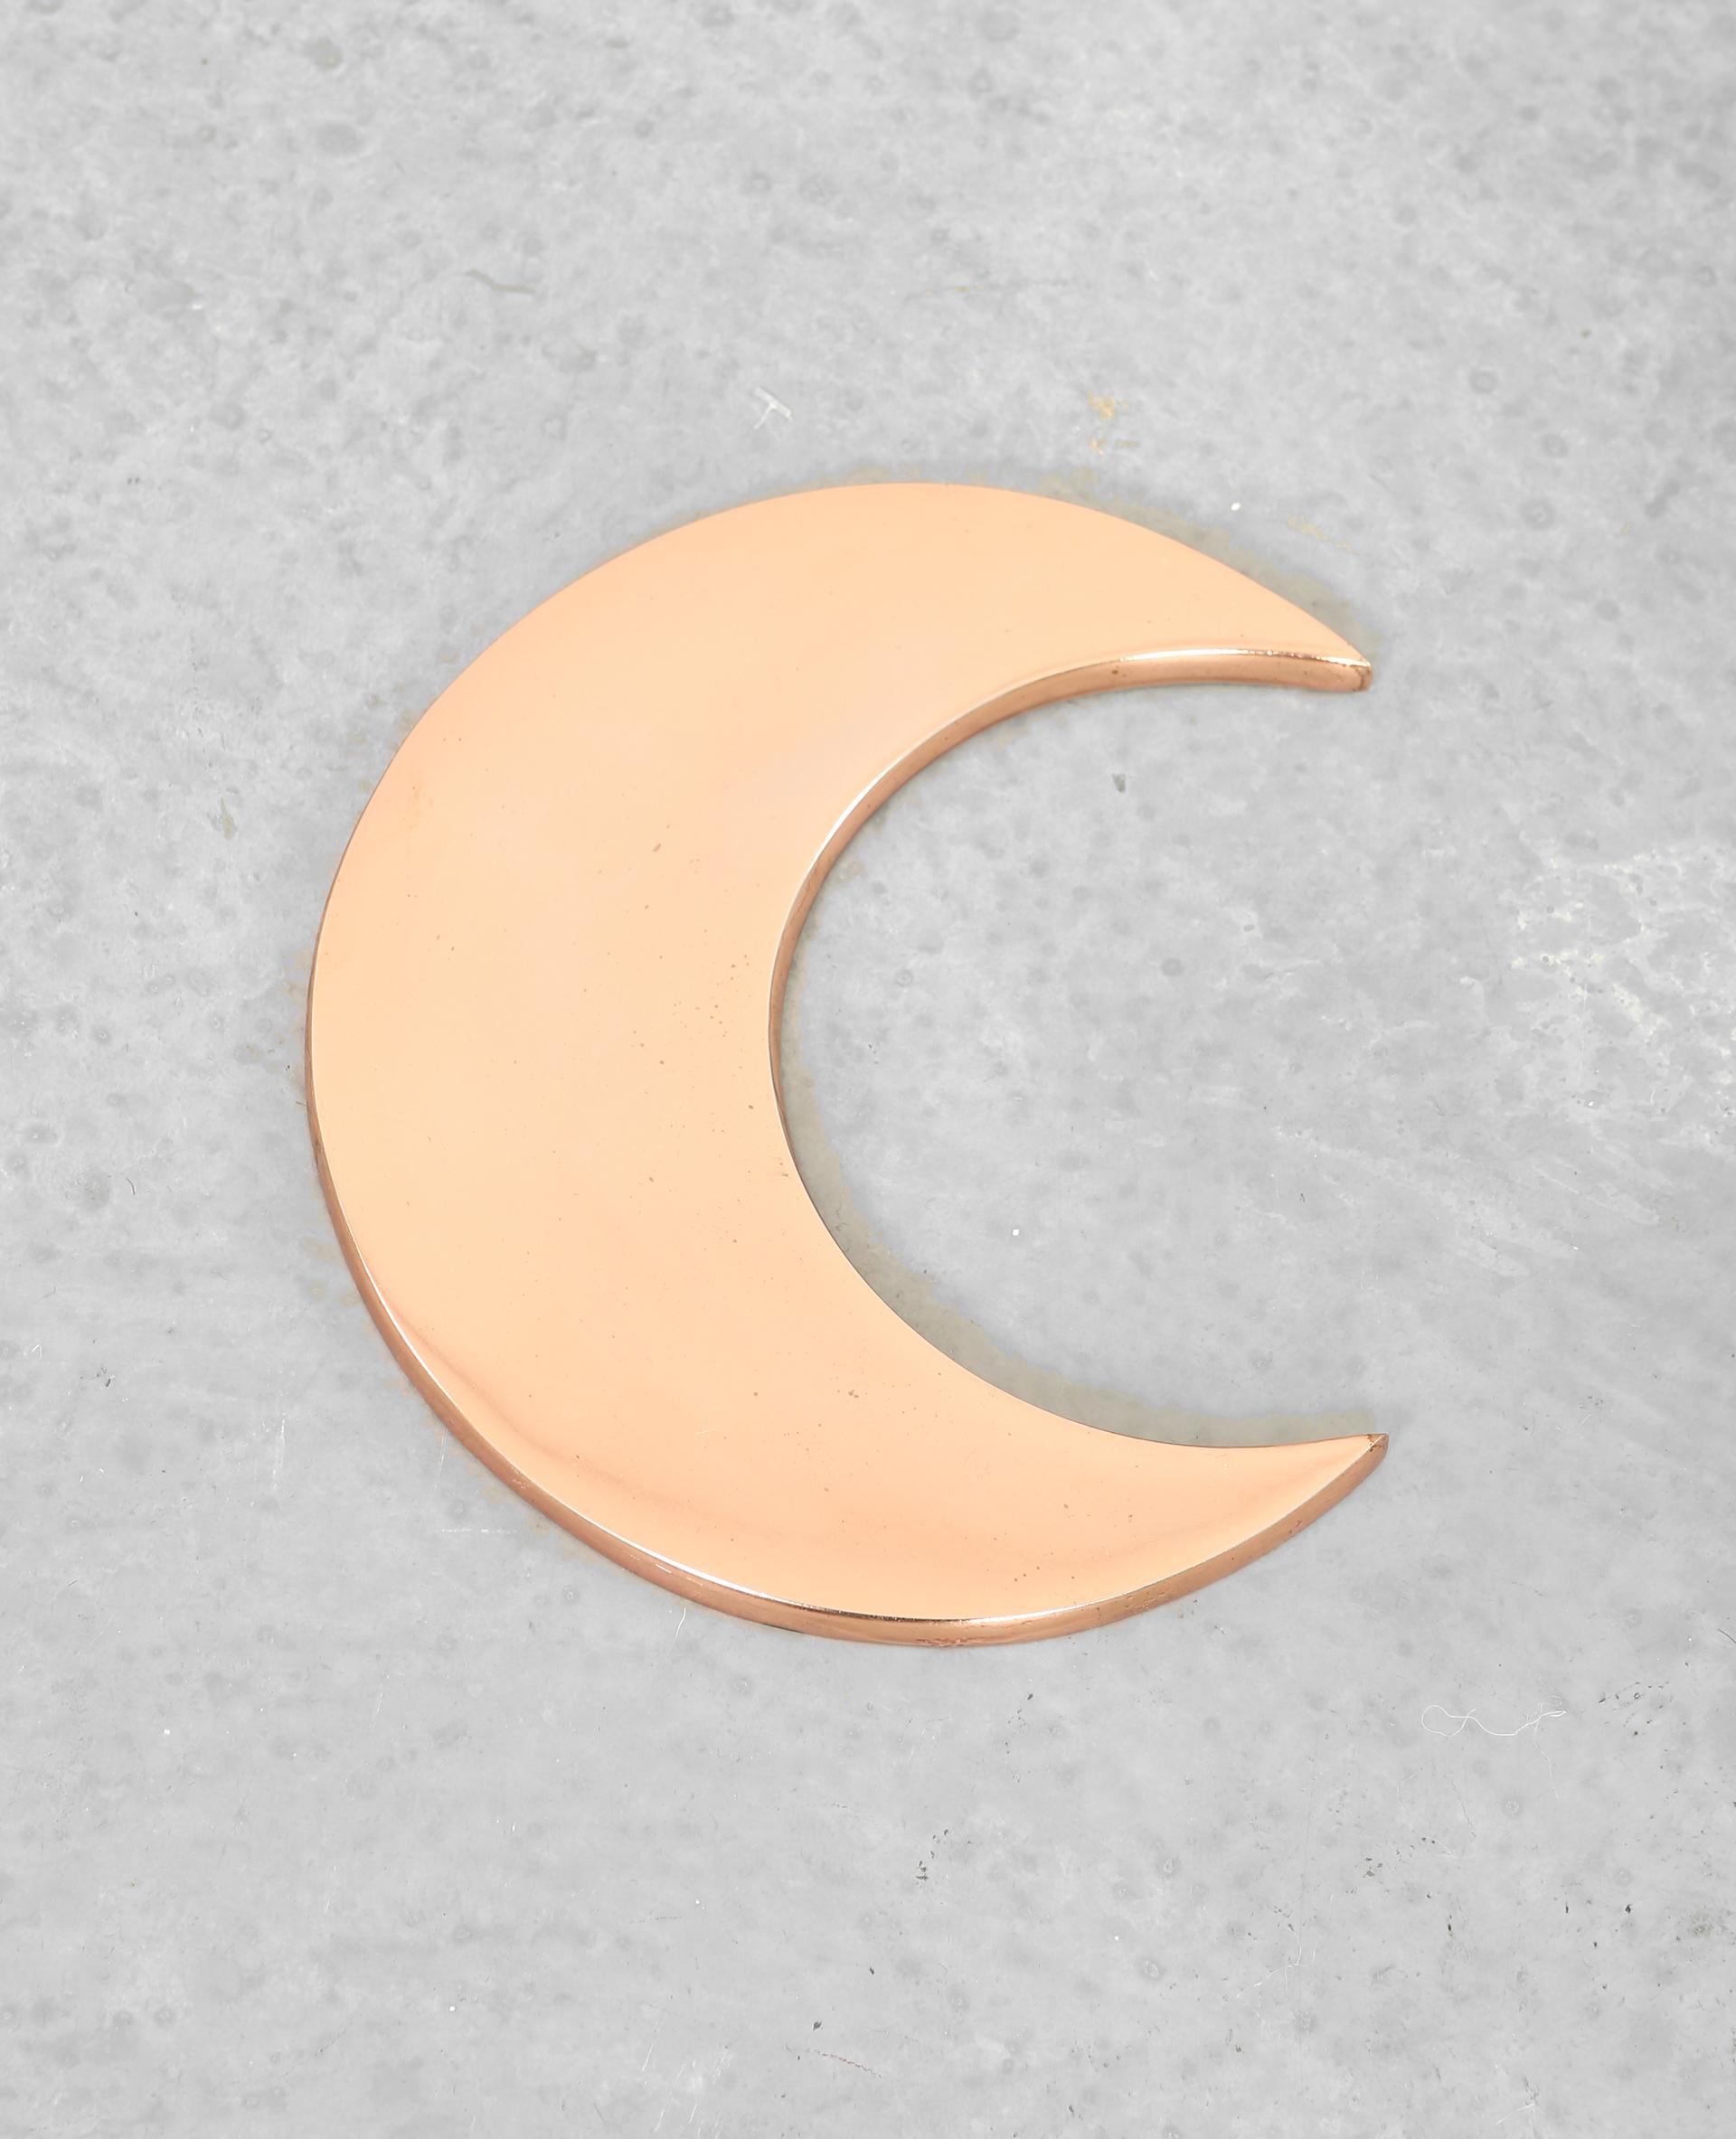 d coration murale lune cuivr 907165g07a0g pimkie. Black Bedroom Furniture Sets. Home Design Ideas